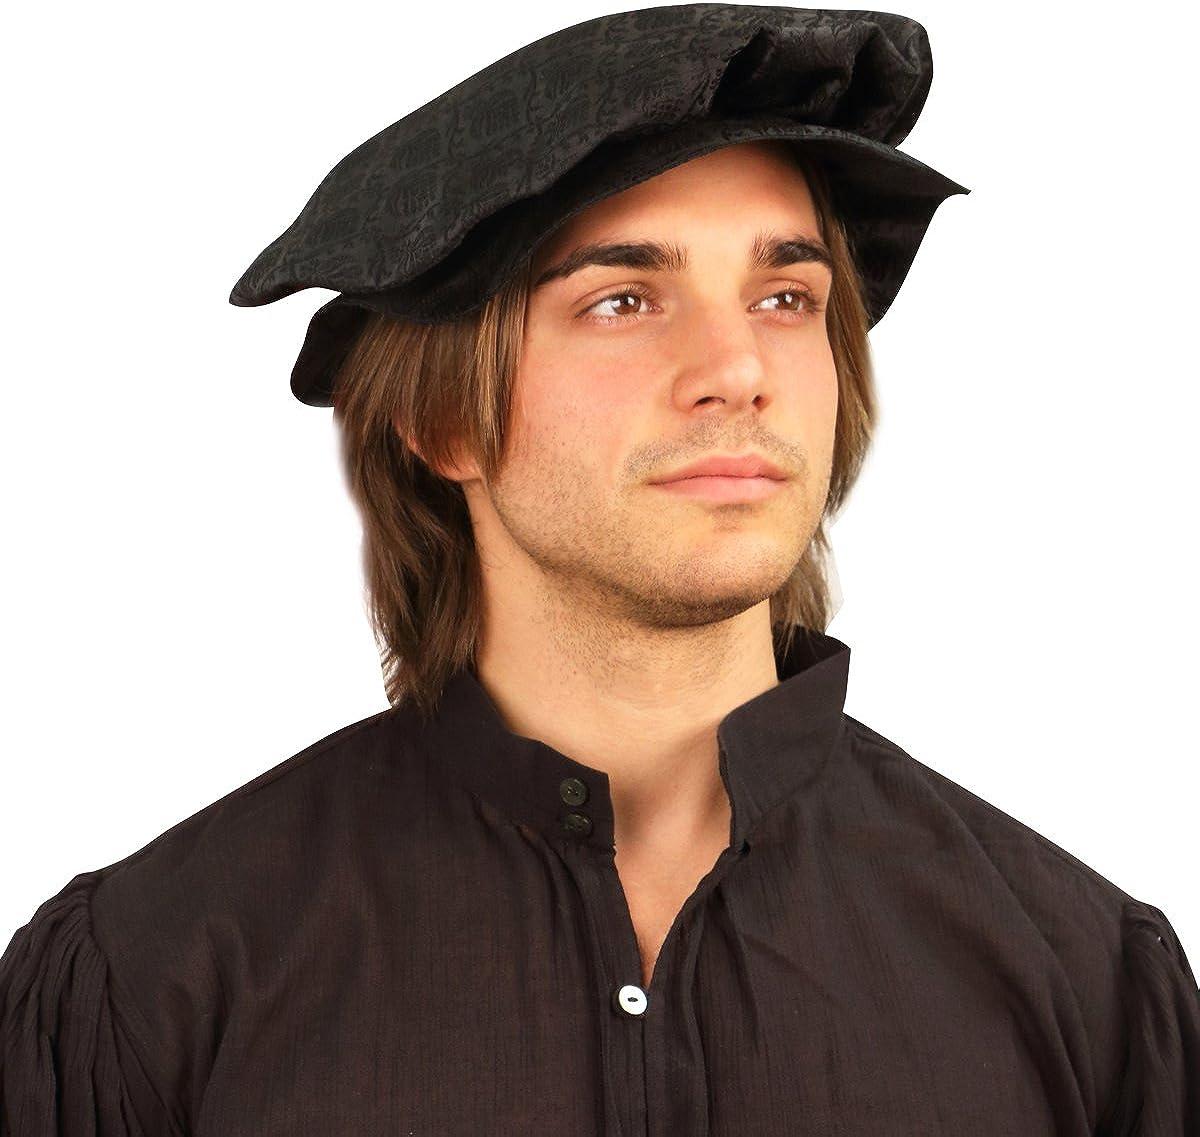 Renaissance Tudor Flat Cap for Men or Women